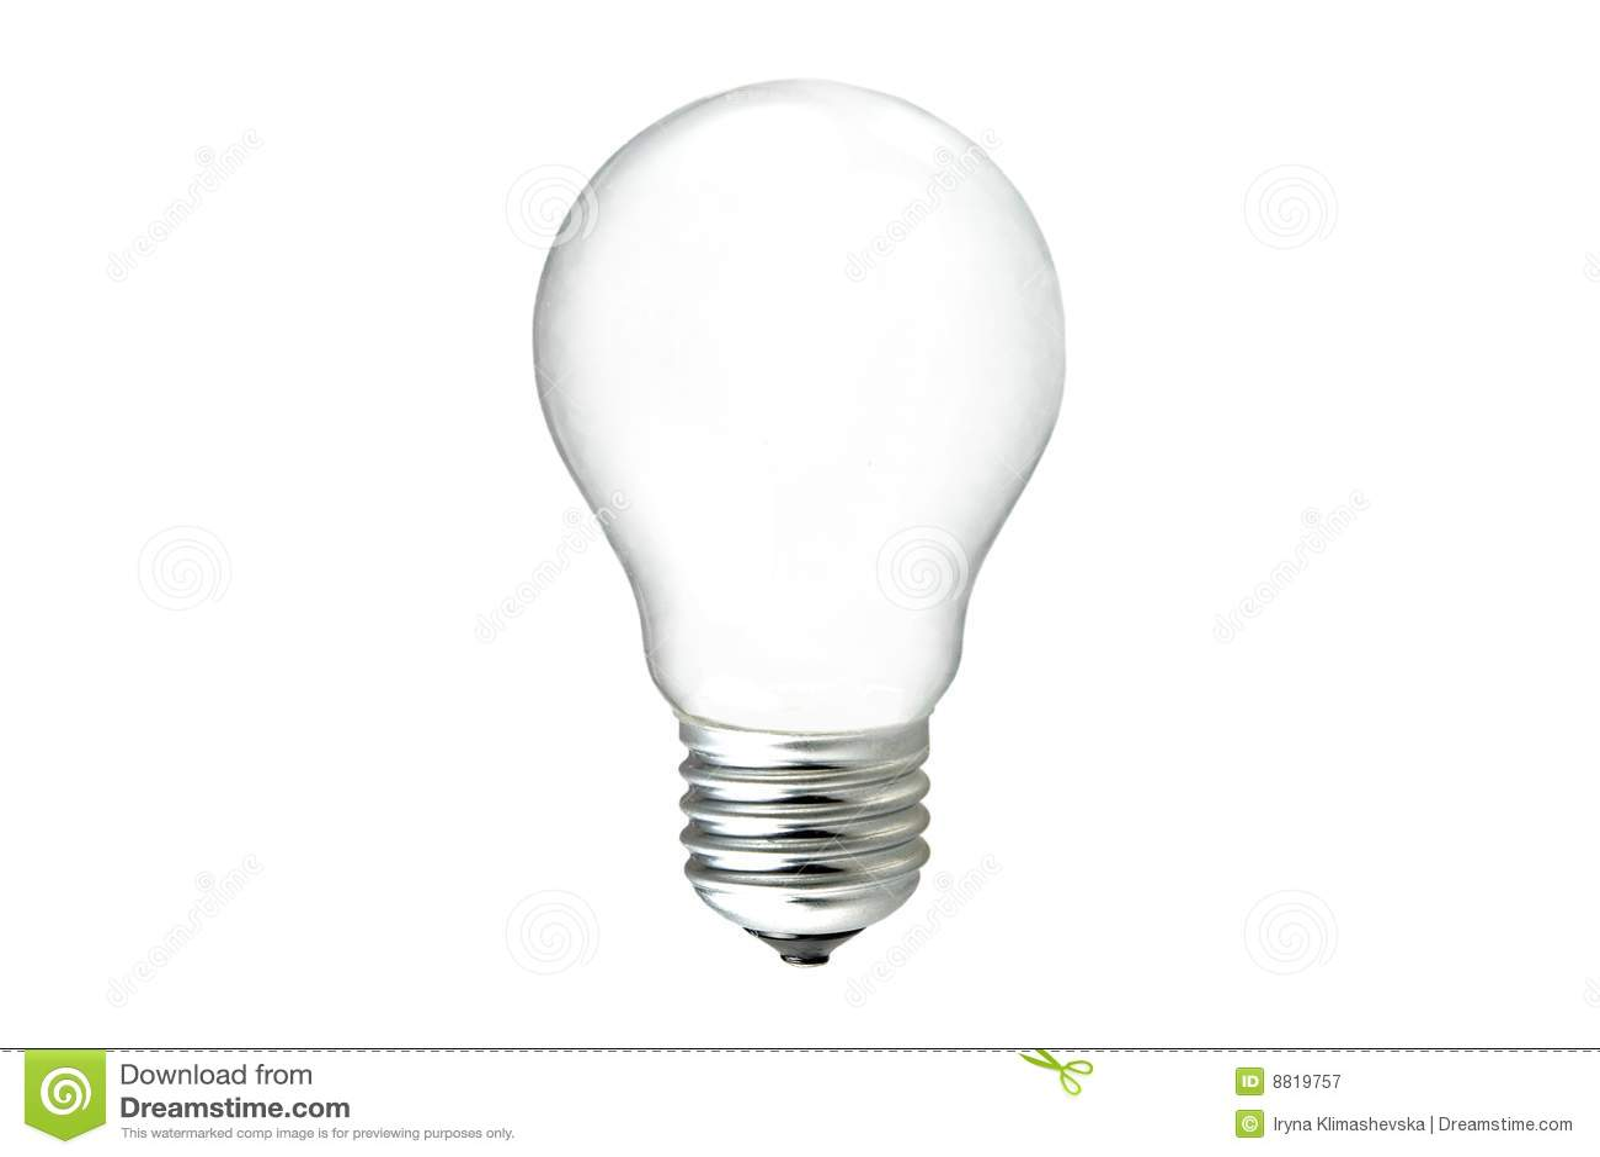 Light Bulb Stock Image Image Of Object Threads Bulb